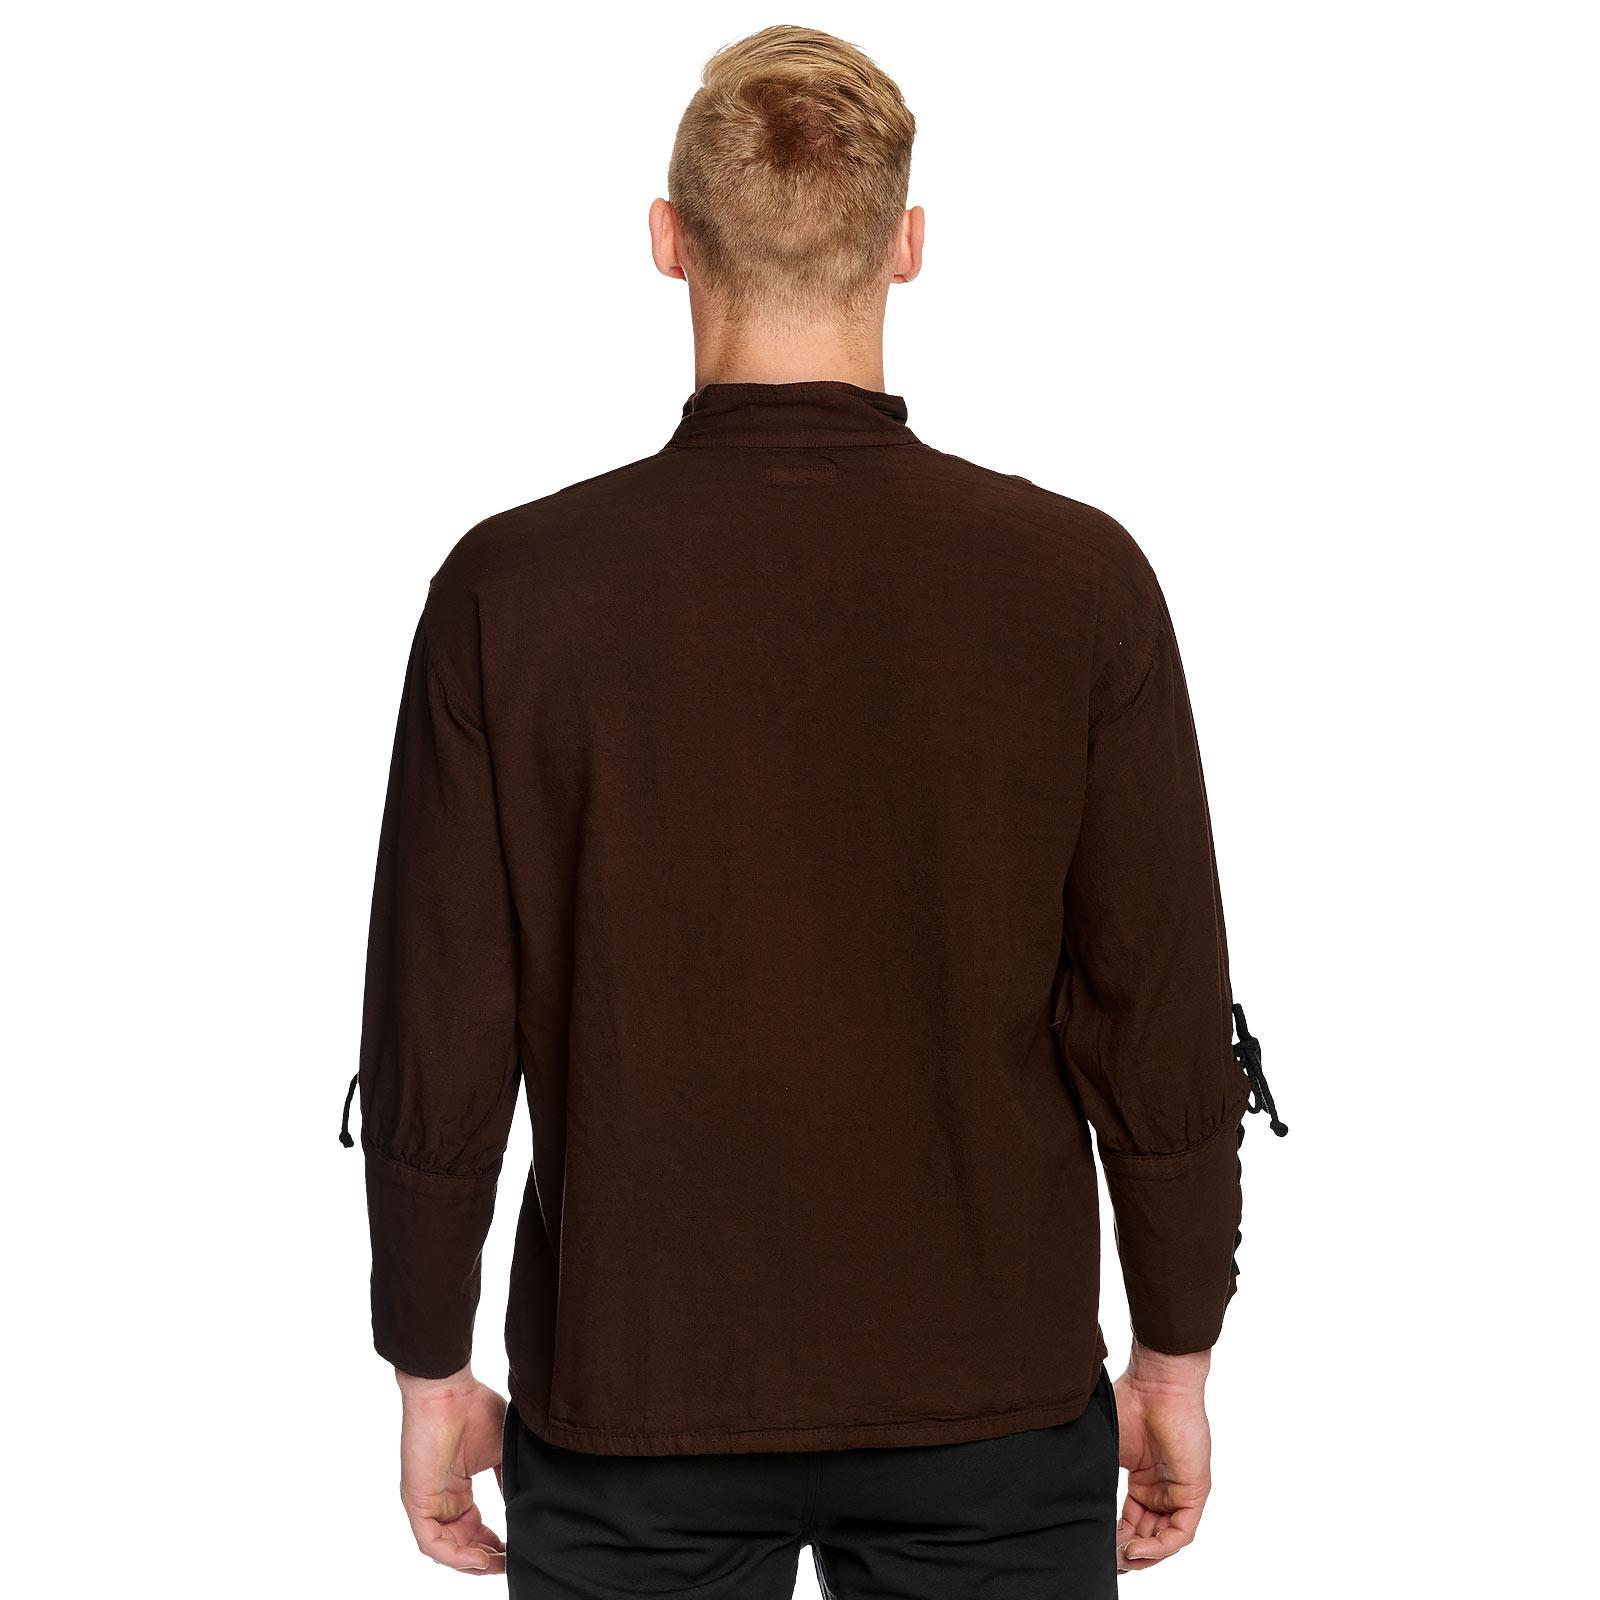 Mittelalter Hemd braun